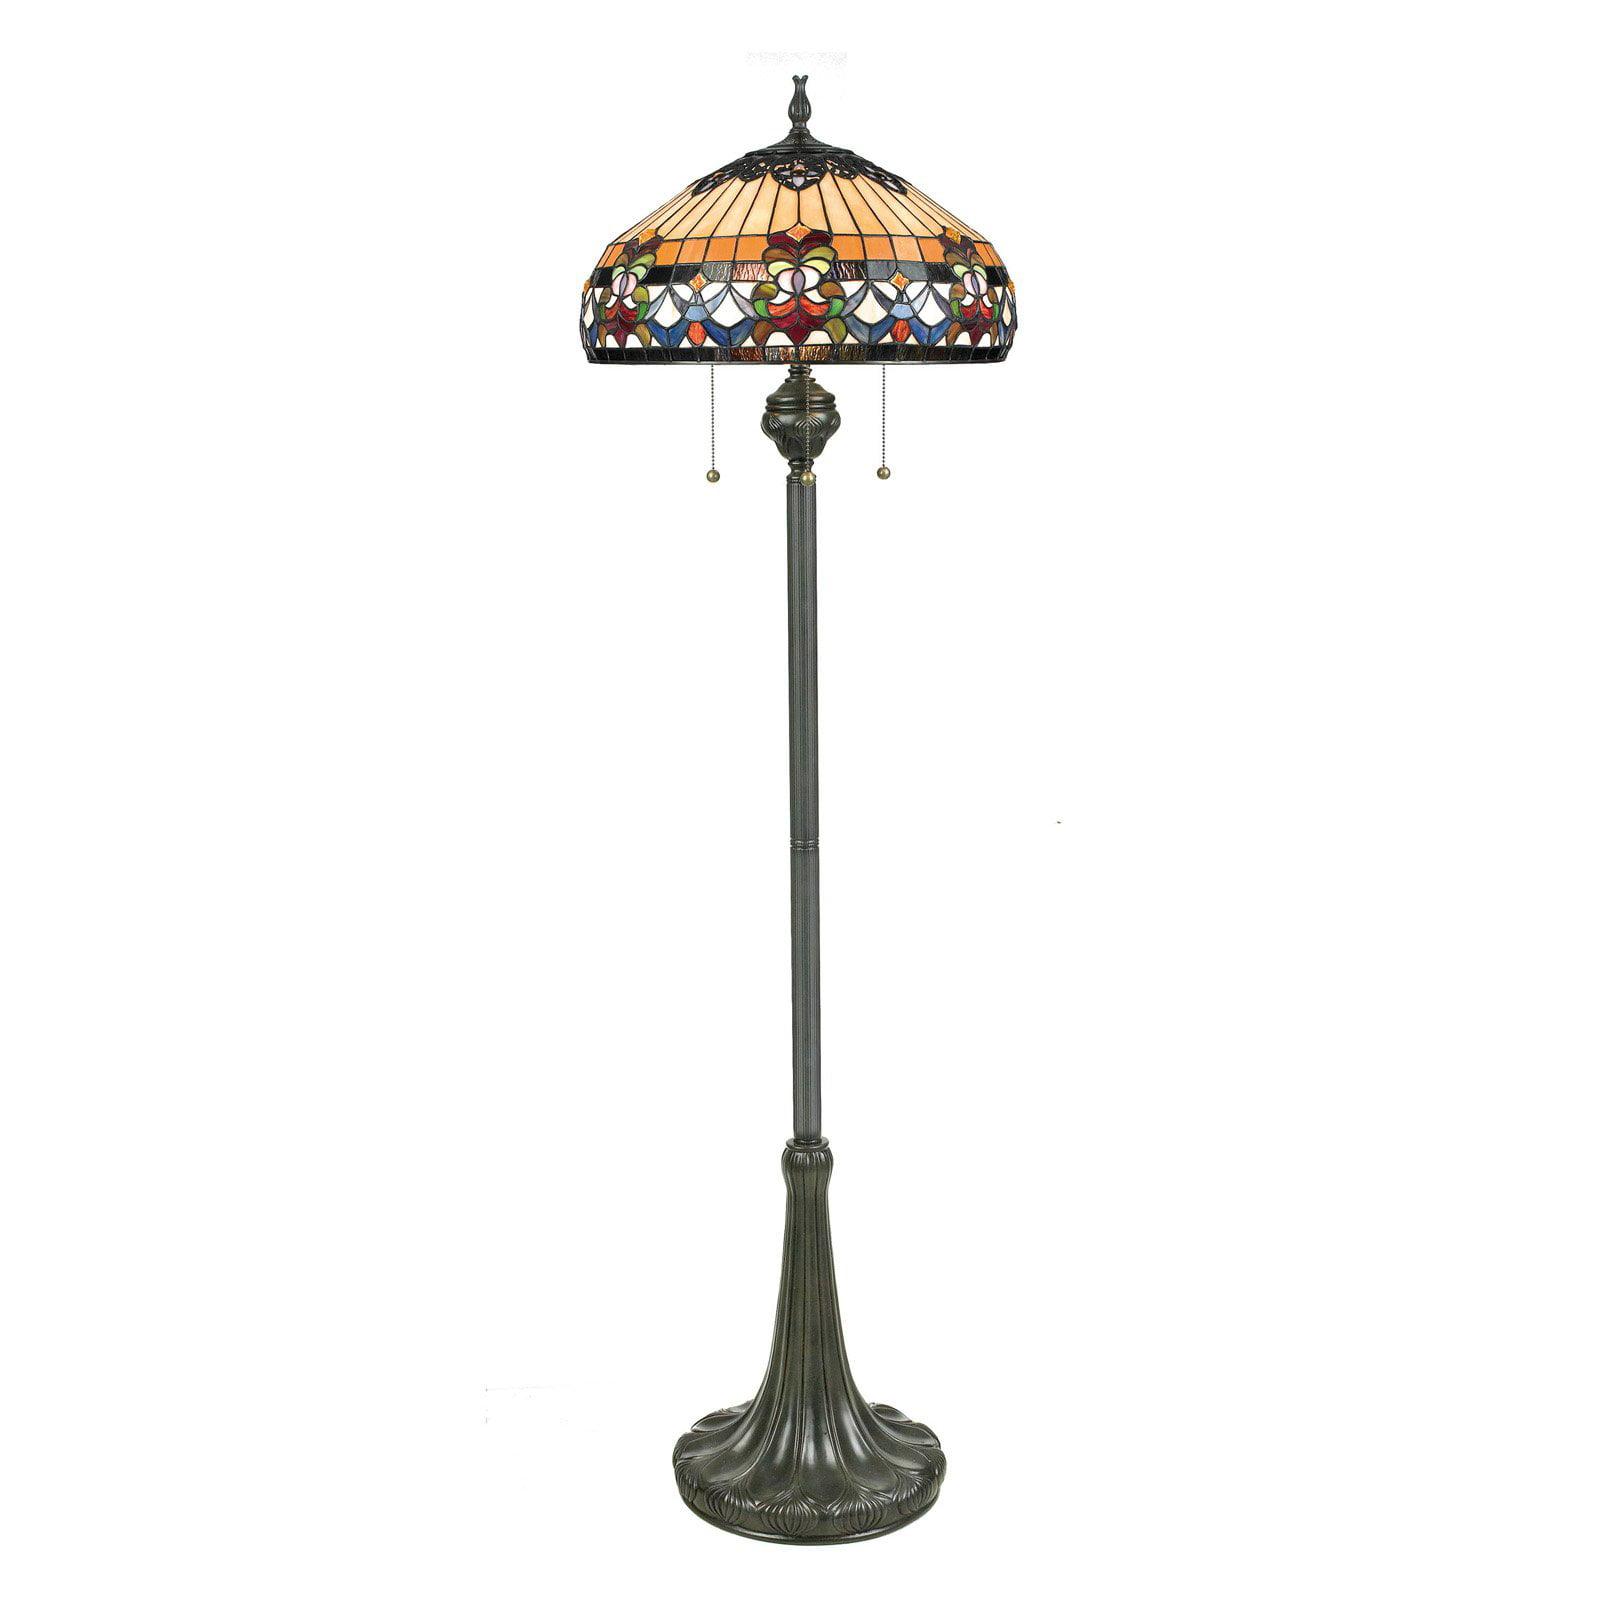 Quoizel Belle Fleur TFBF9362VB Floor Lamp